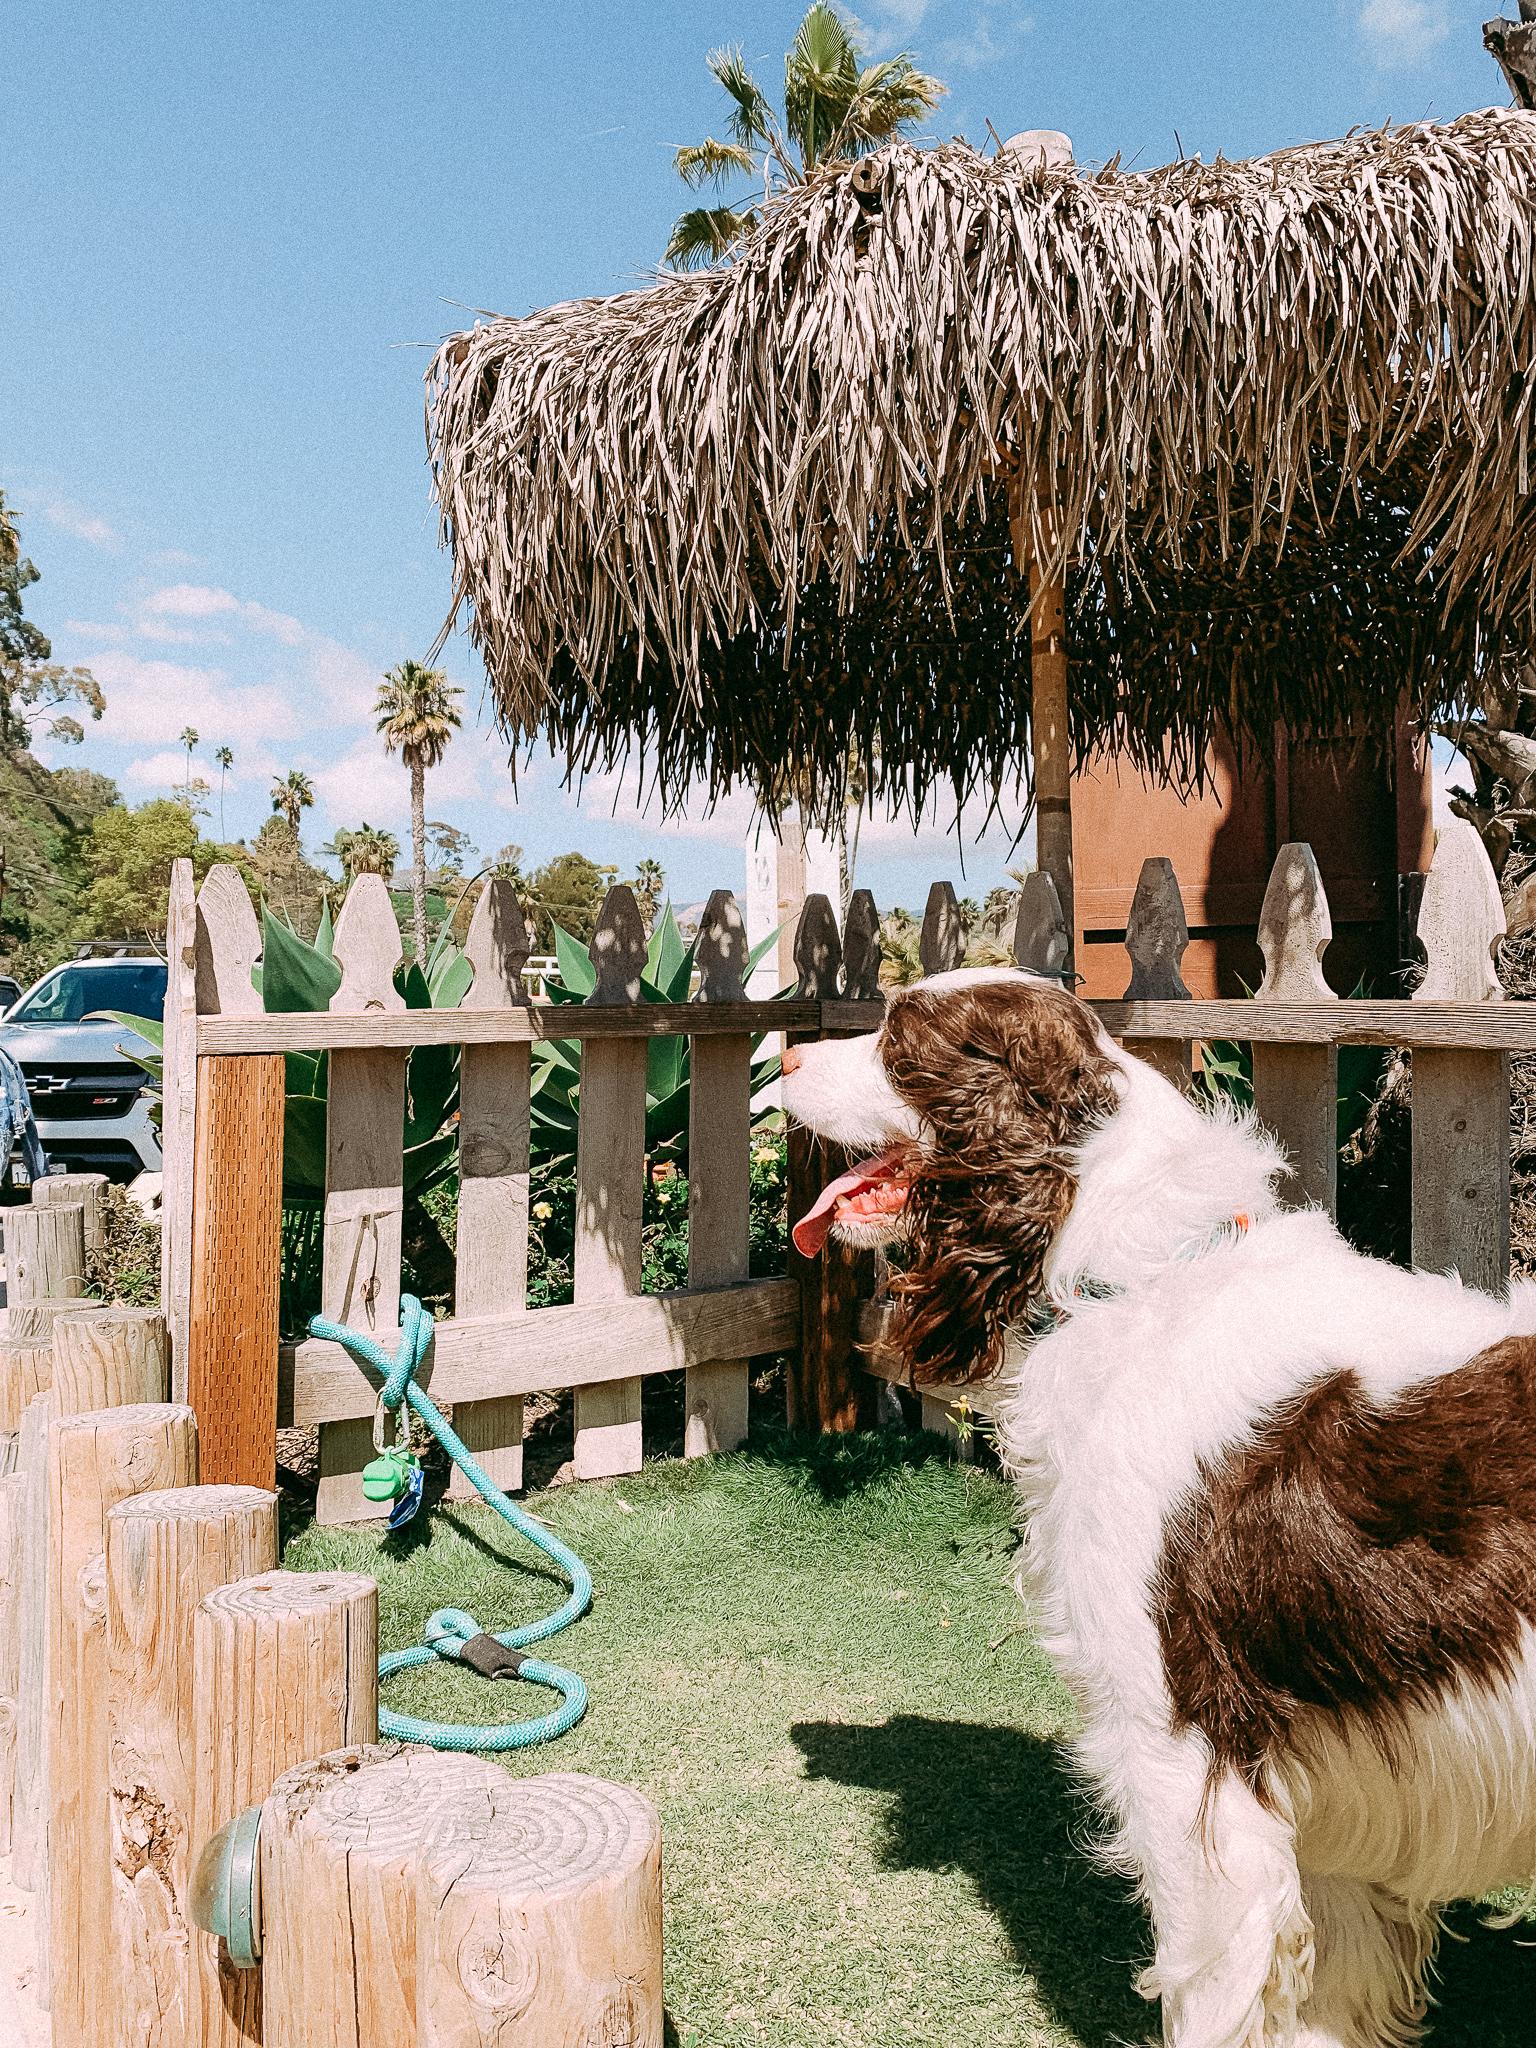 hendrys beach santa barbara california